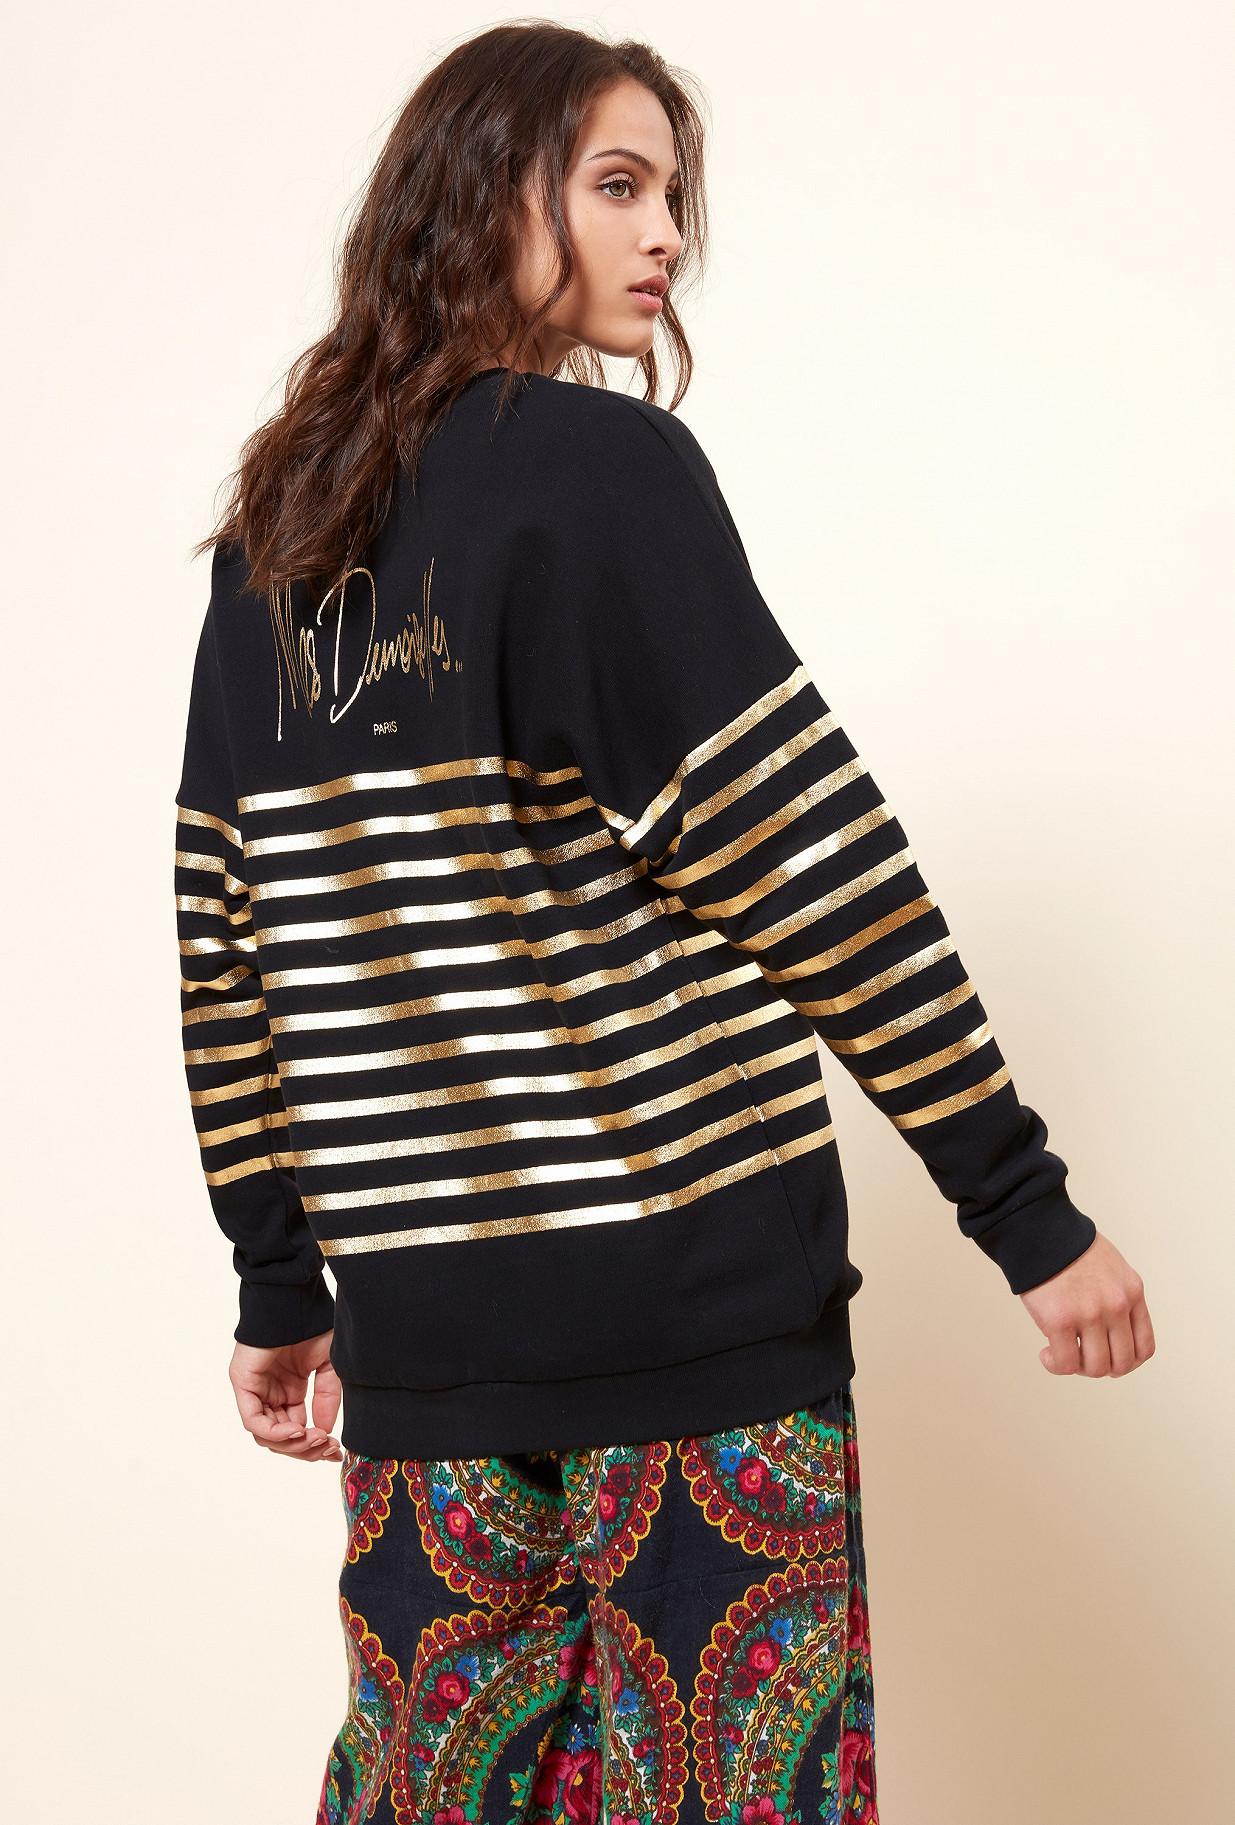 Paris clothes store Sweater  Cambon french designer fashion Paris